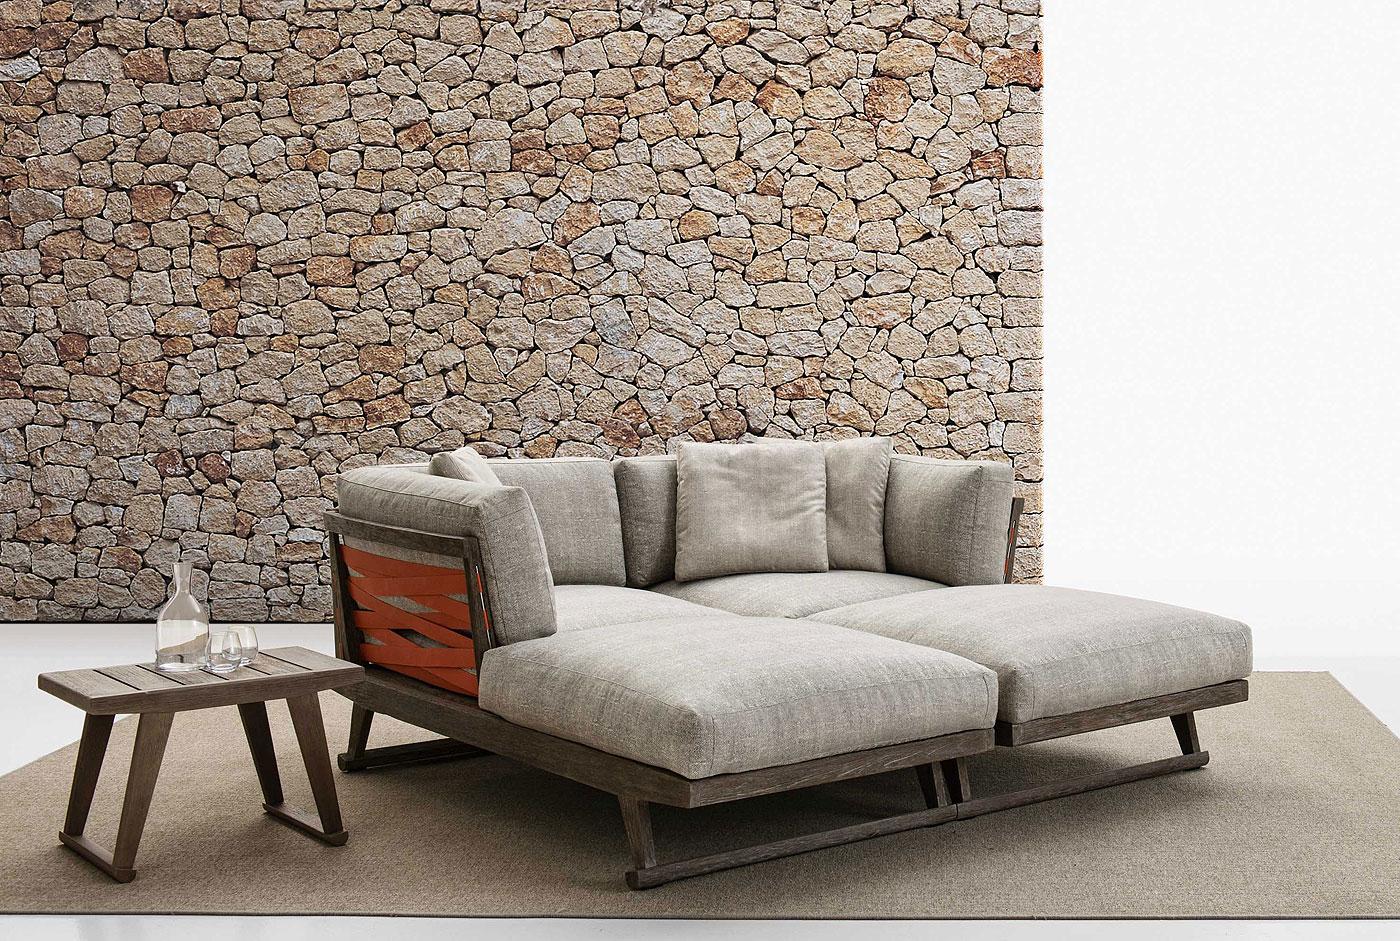 mobiliario-gio-outdoor-gio-antonio-citterio-B&B-Italia (3)